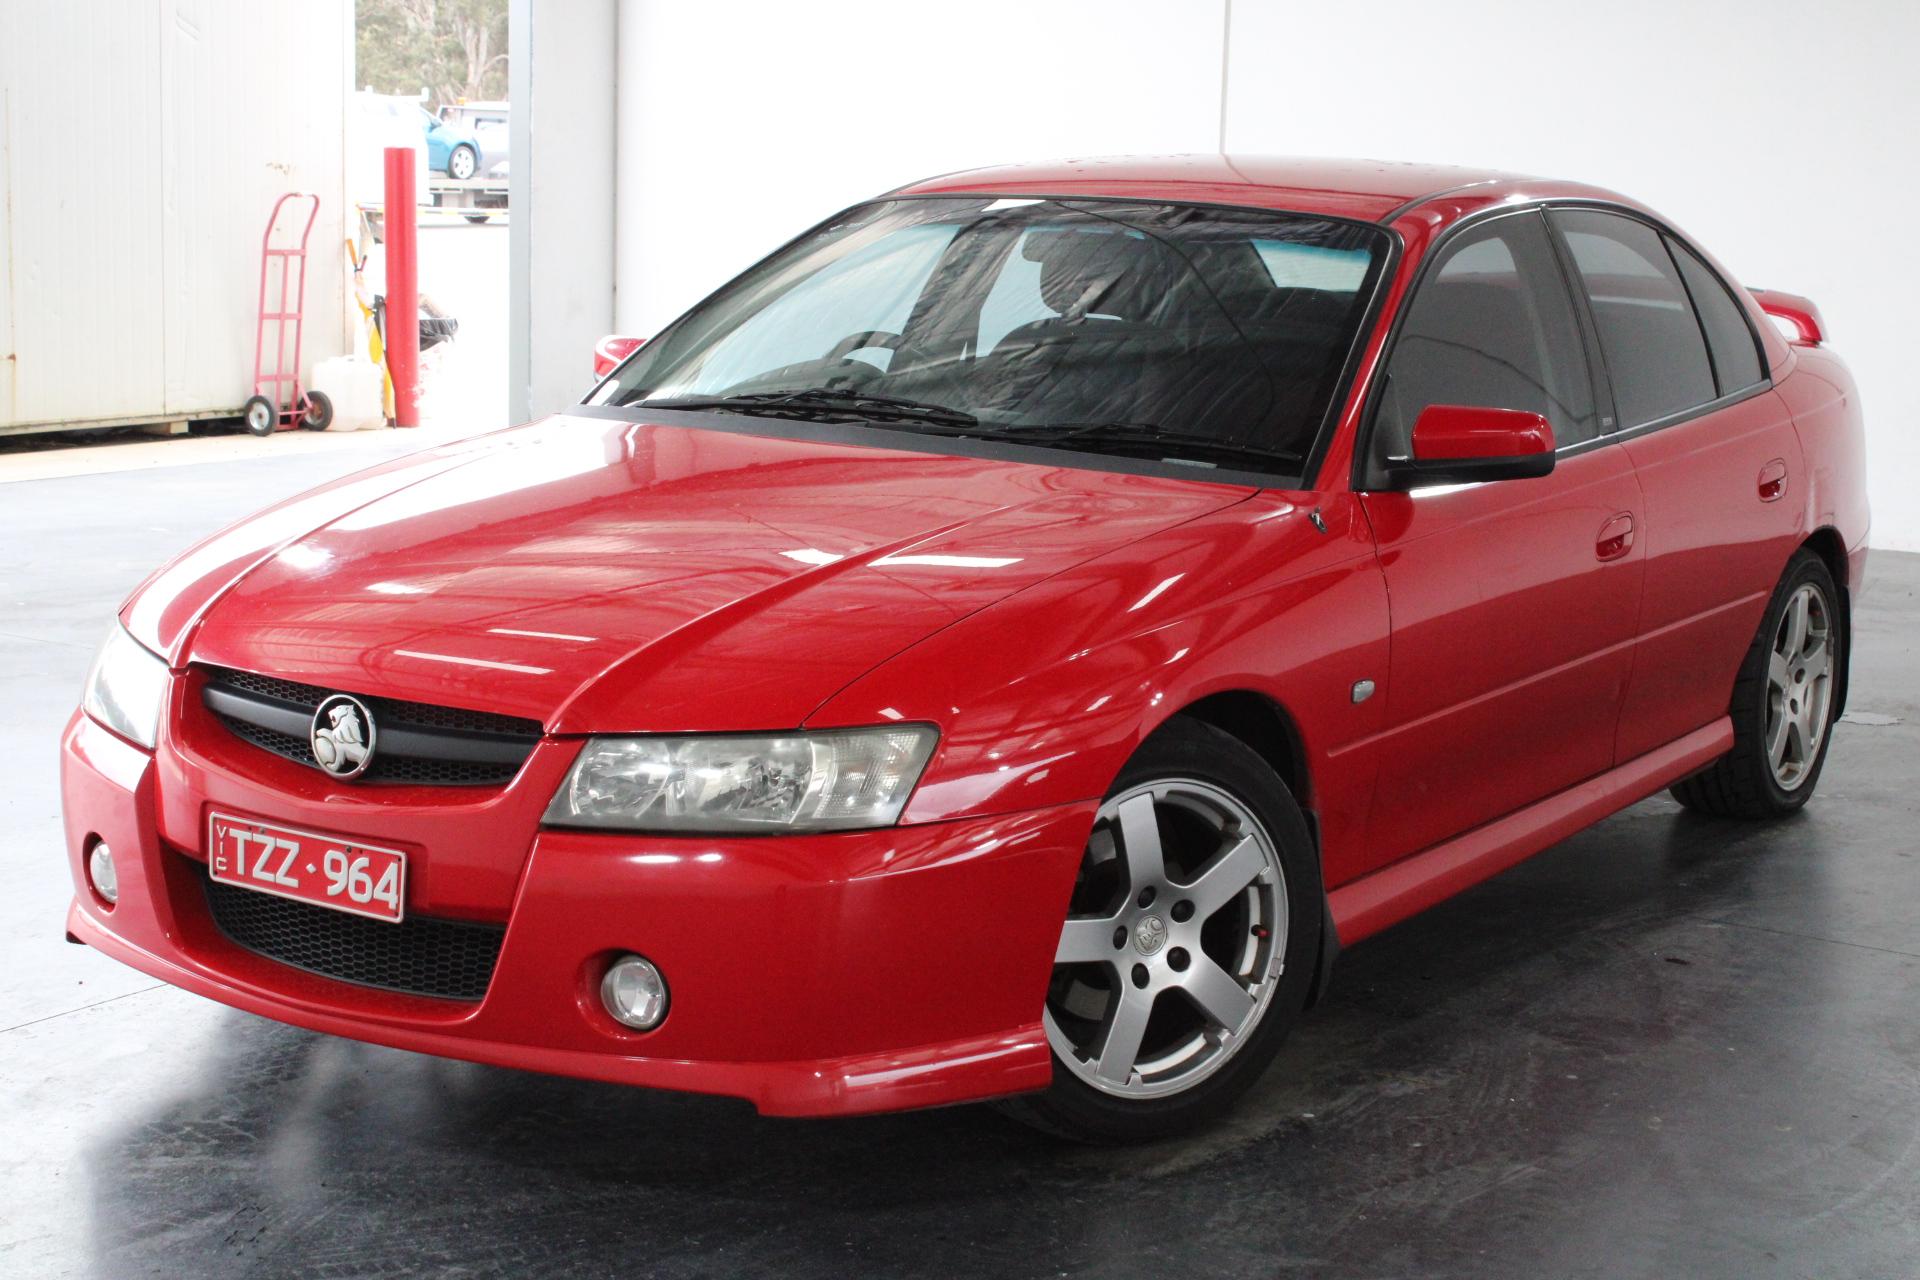 2006 Holden Commodore SV6 VZ Automatic Sedan. RWC supplied